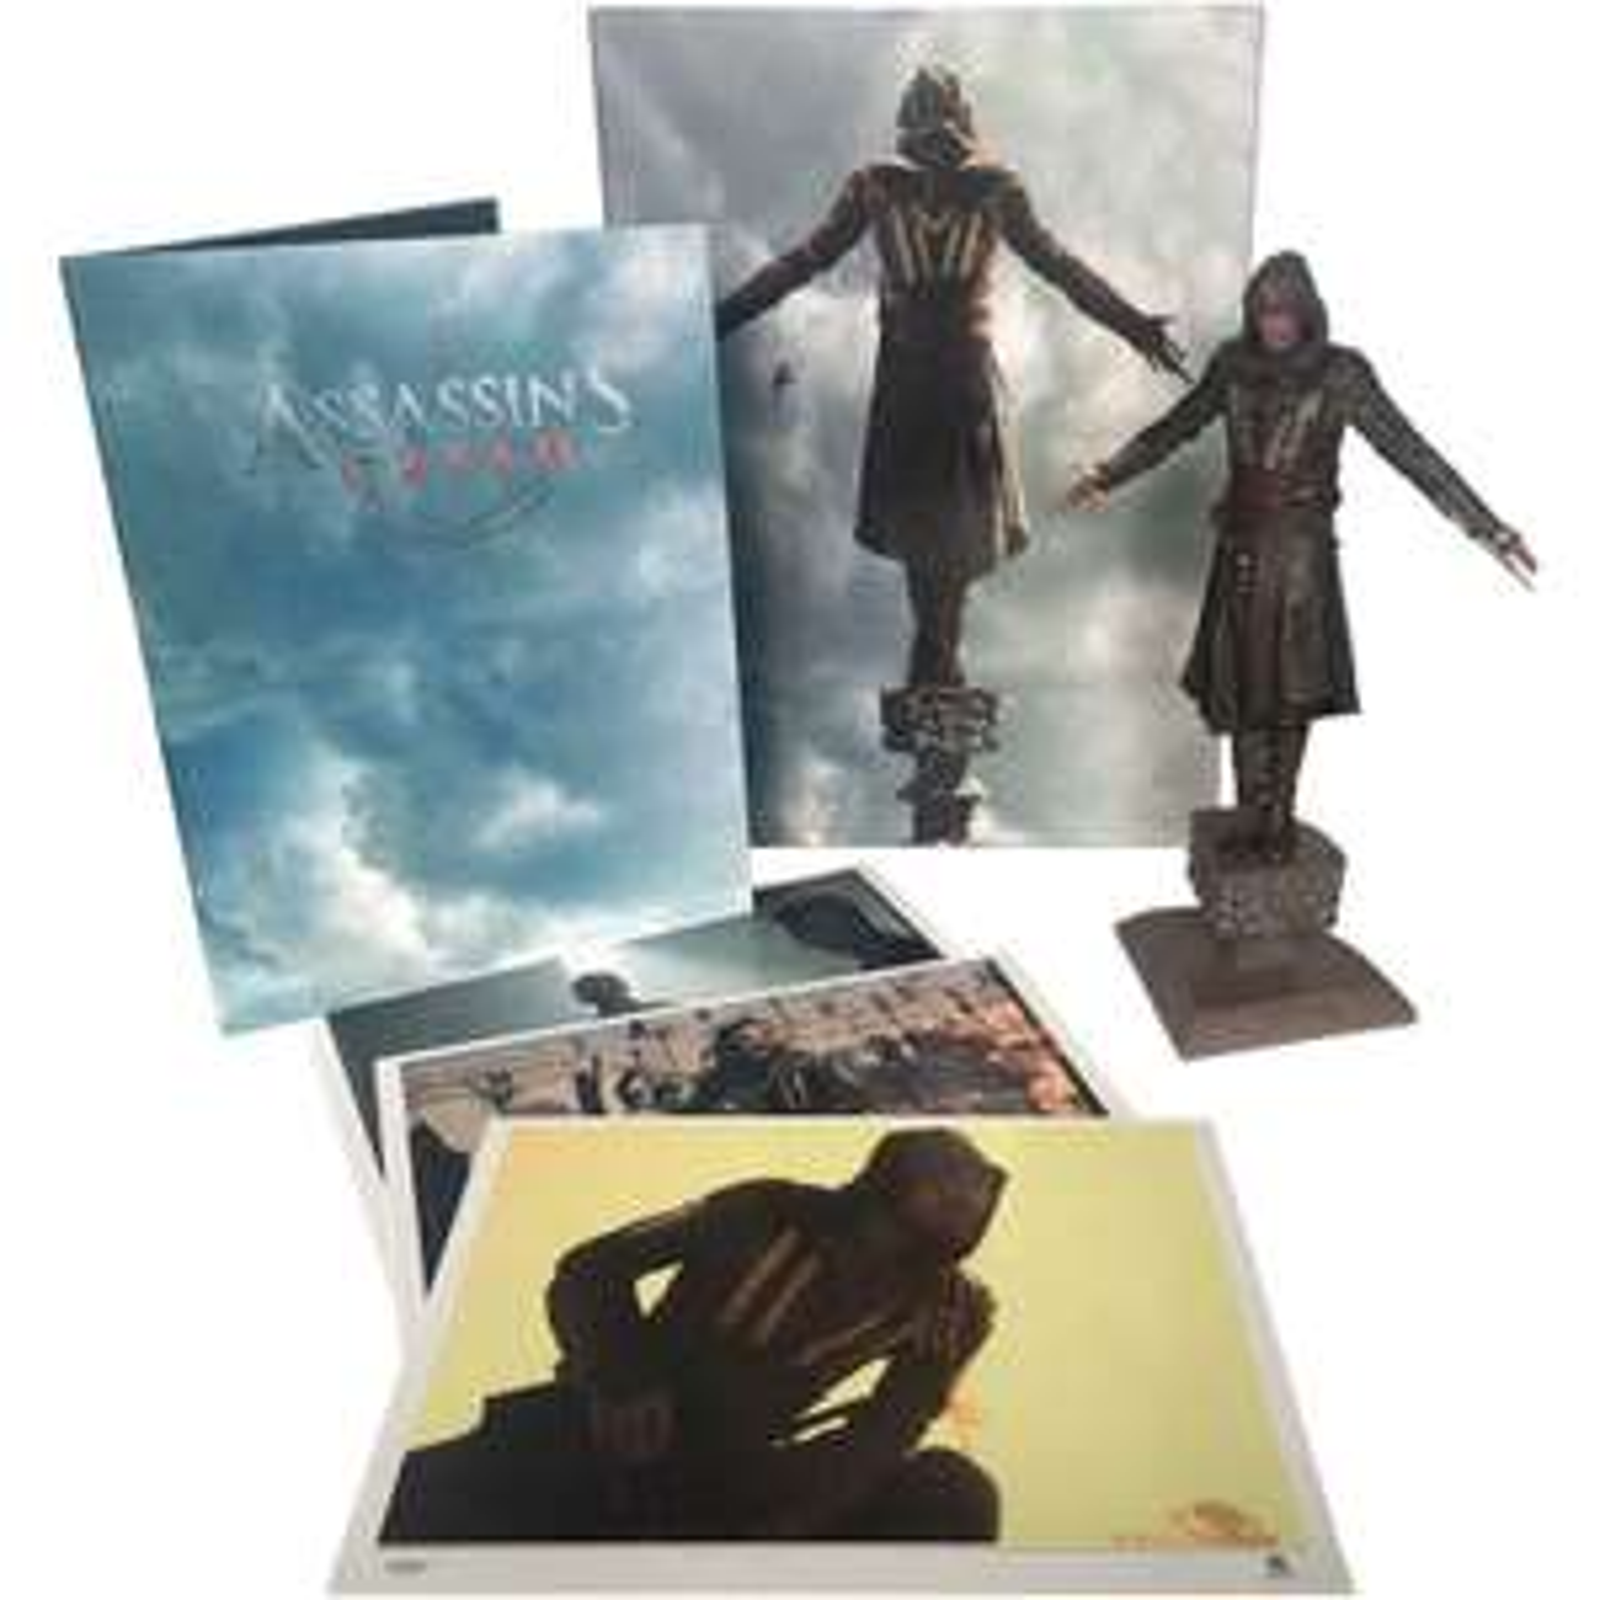 Assassin's Creed Collector's Edition Statue 35 cm + Backdrop Diorama + 3 Kunstdrucke